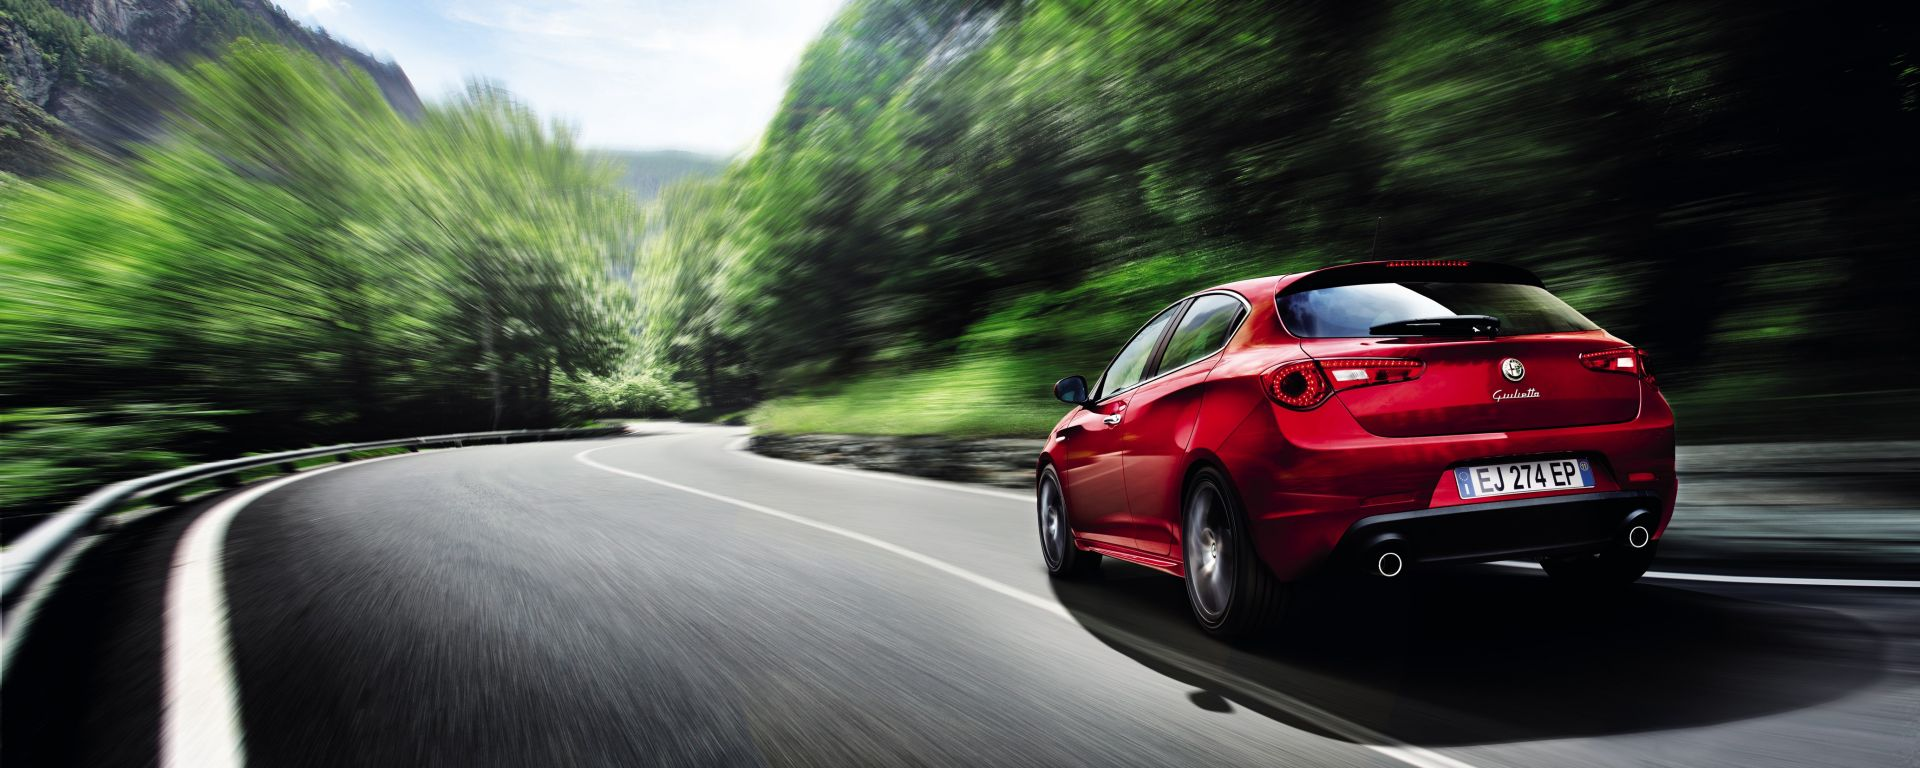 Alfa Romeo Giulietta 1.4 GPL Turbo